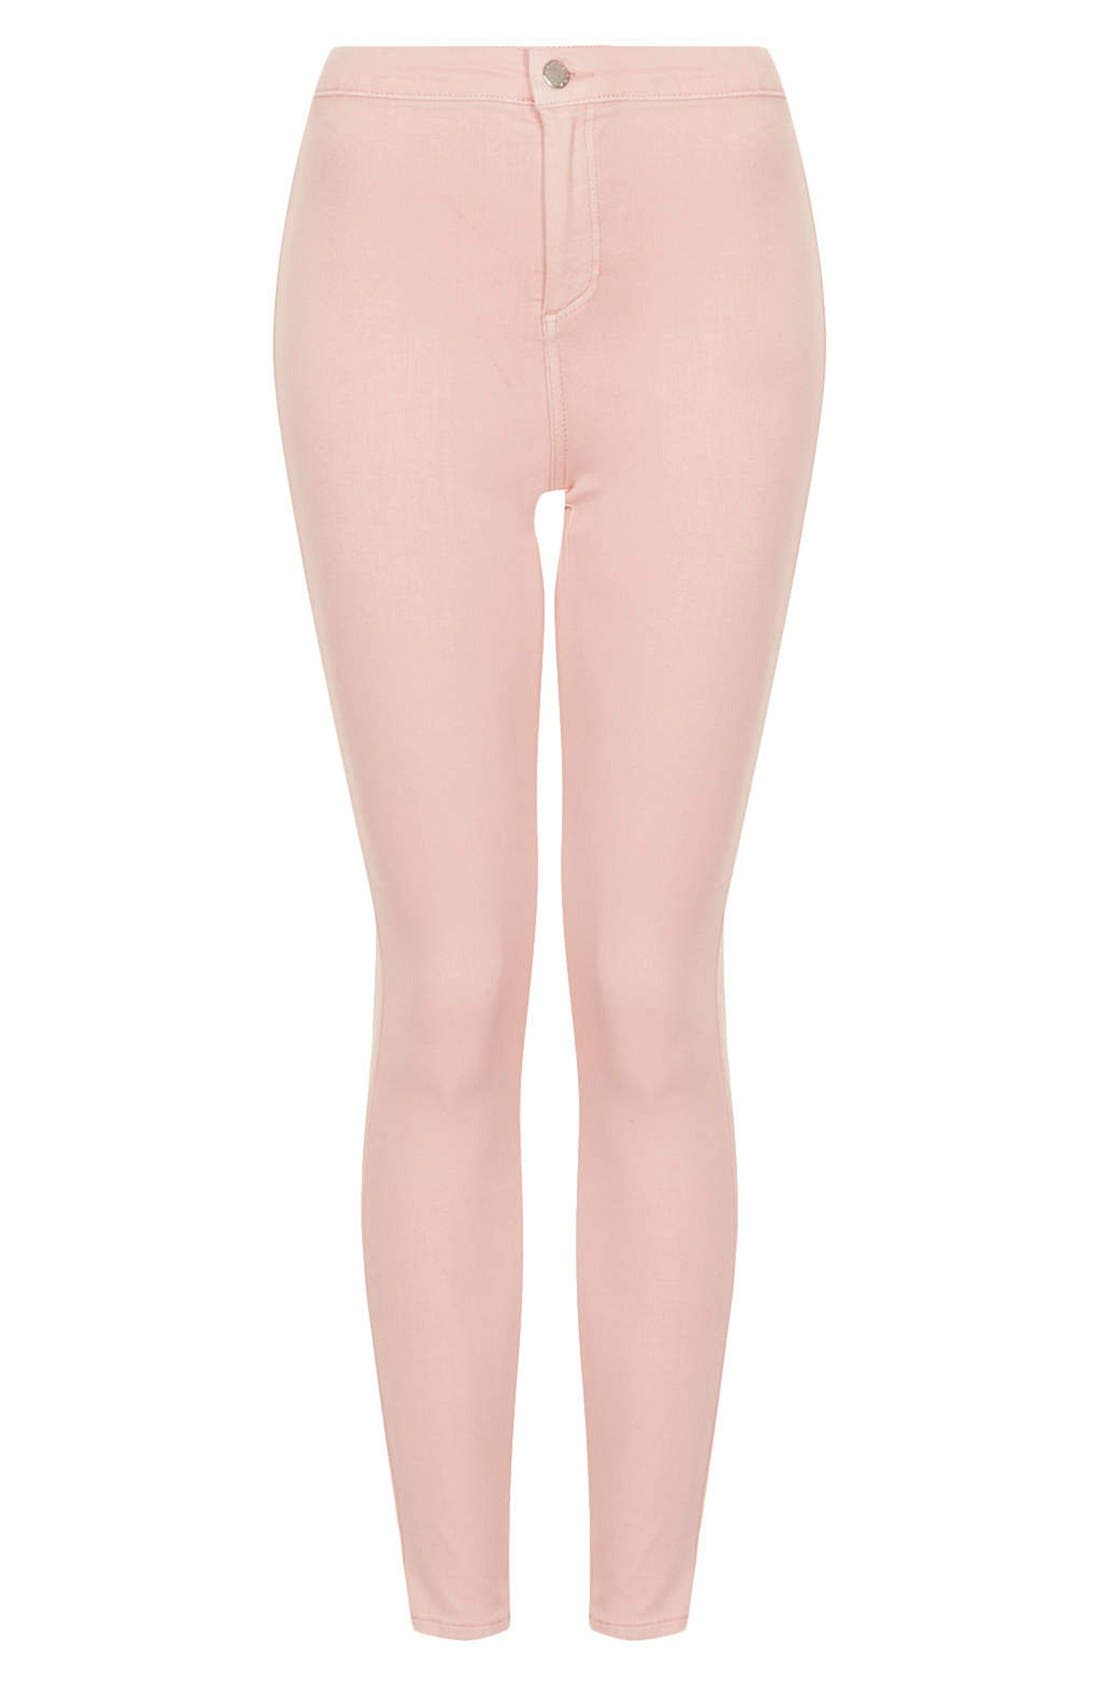 Alternate Image 3  - Topshop Moto 'Joni' High Waist Skinny Jeans (Light Pink)